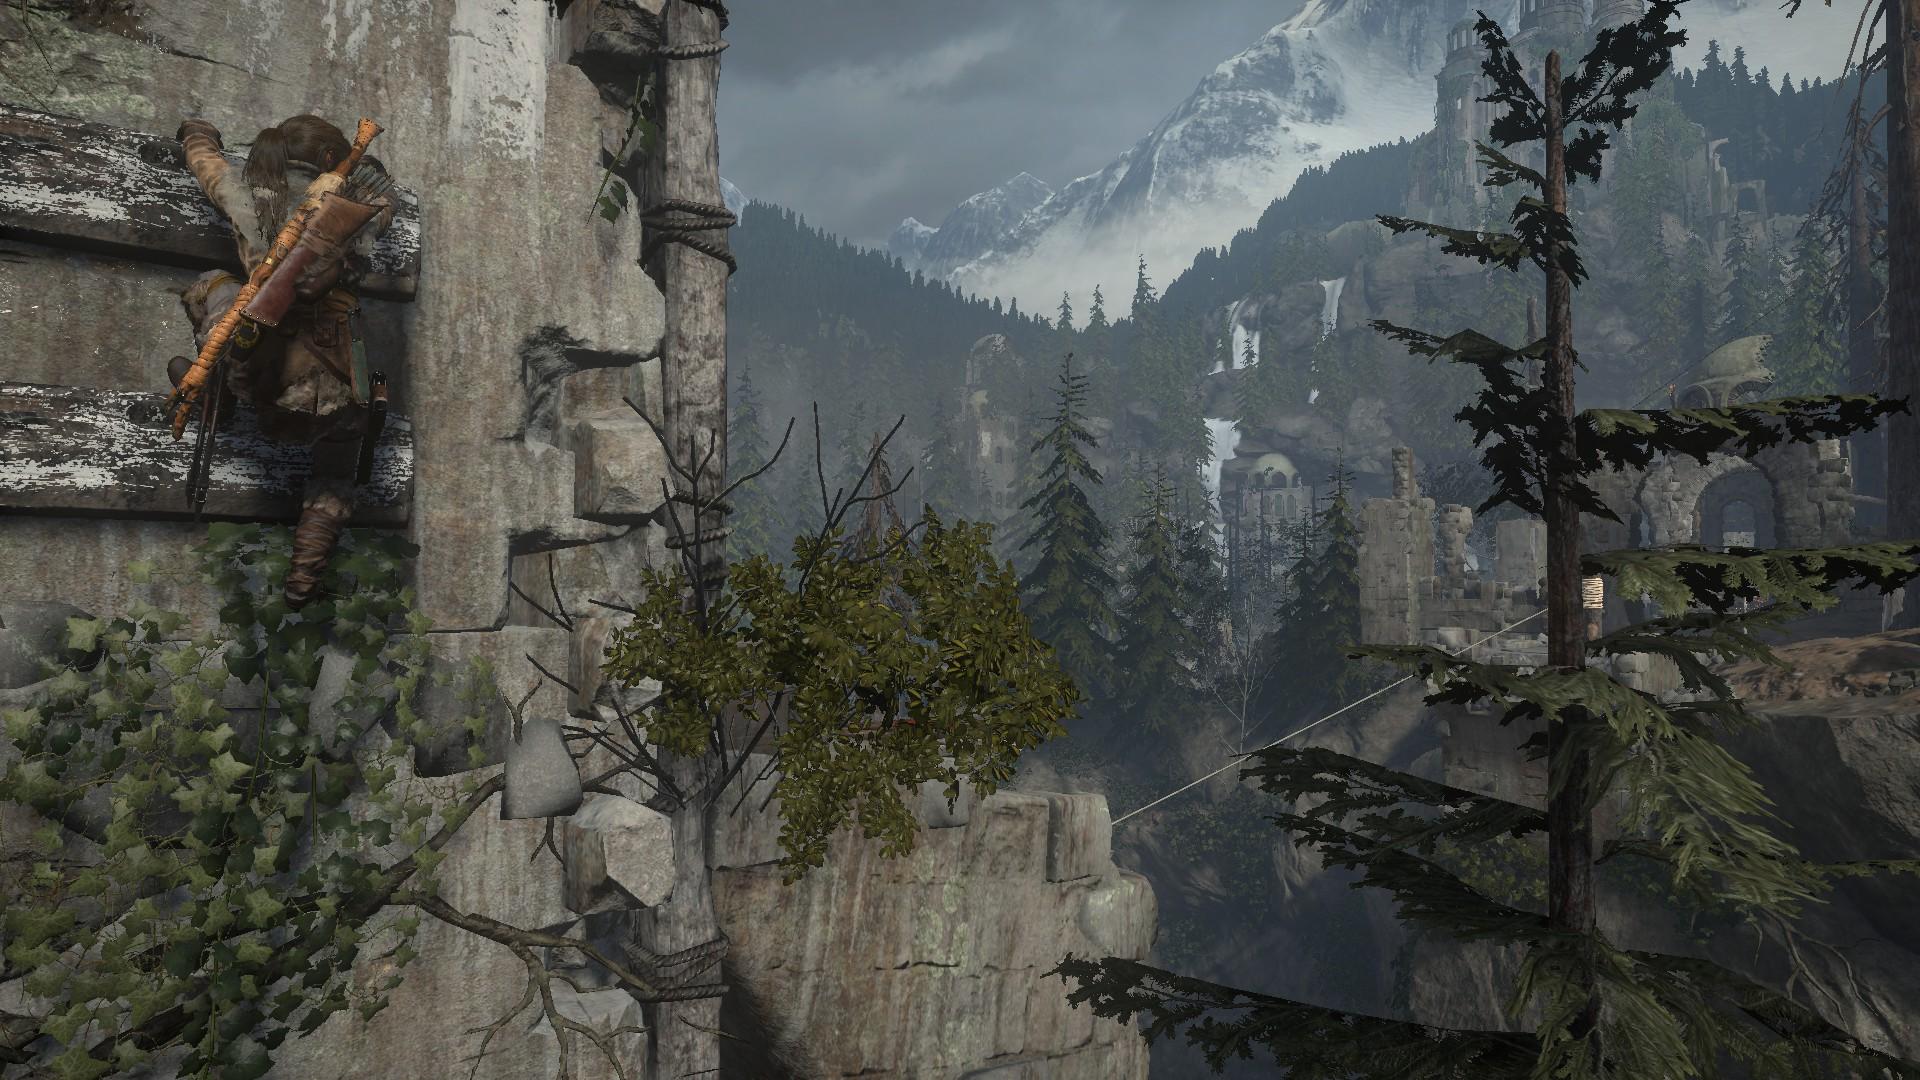 20171223121308_1.jpg - Rise of the Tomb Raider